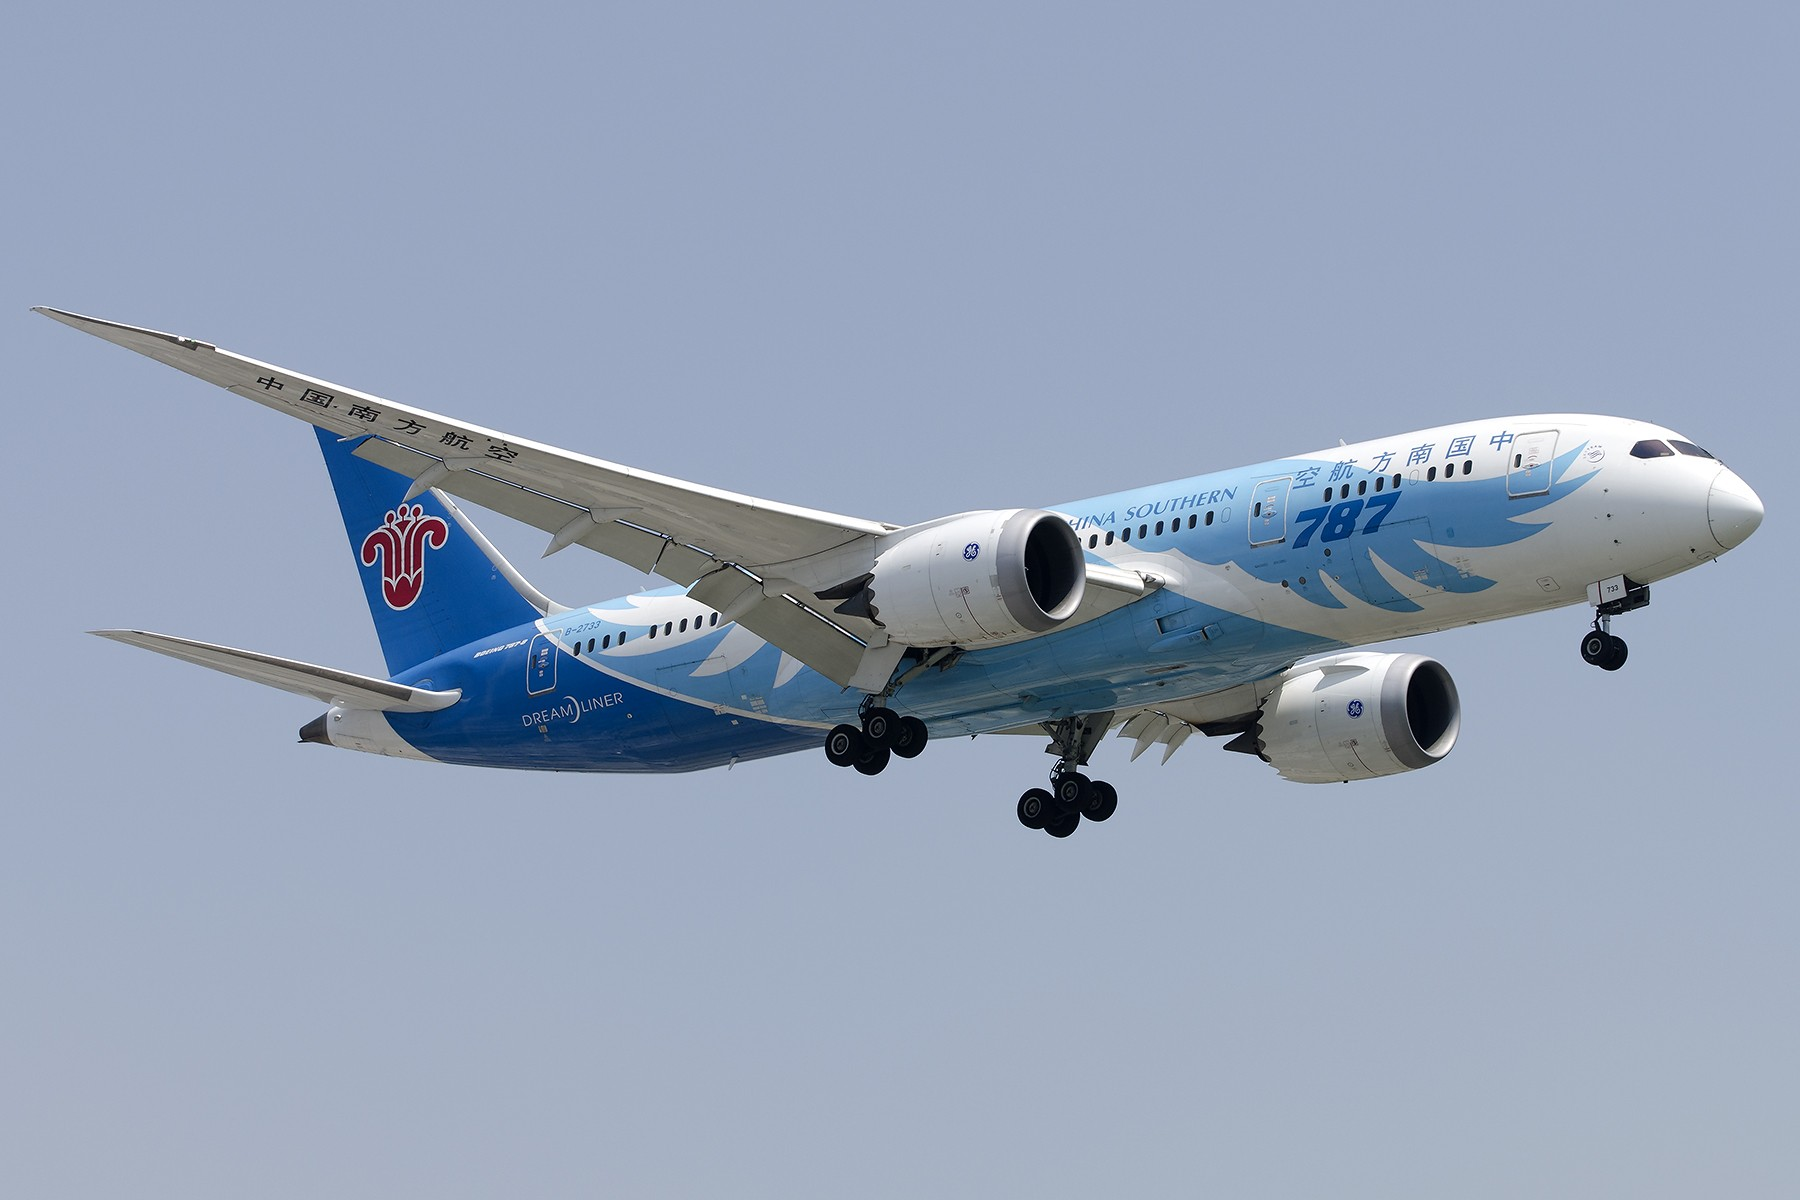 Re:[原创][原创]【SHA拍机*1800大图】4月拍的了,记得那天好货还挺多 BOEING 787-8 B-2733 中国上海虹桥国际机场